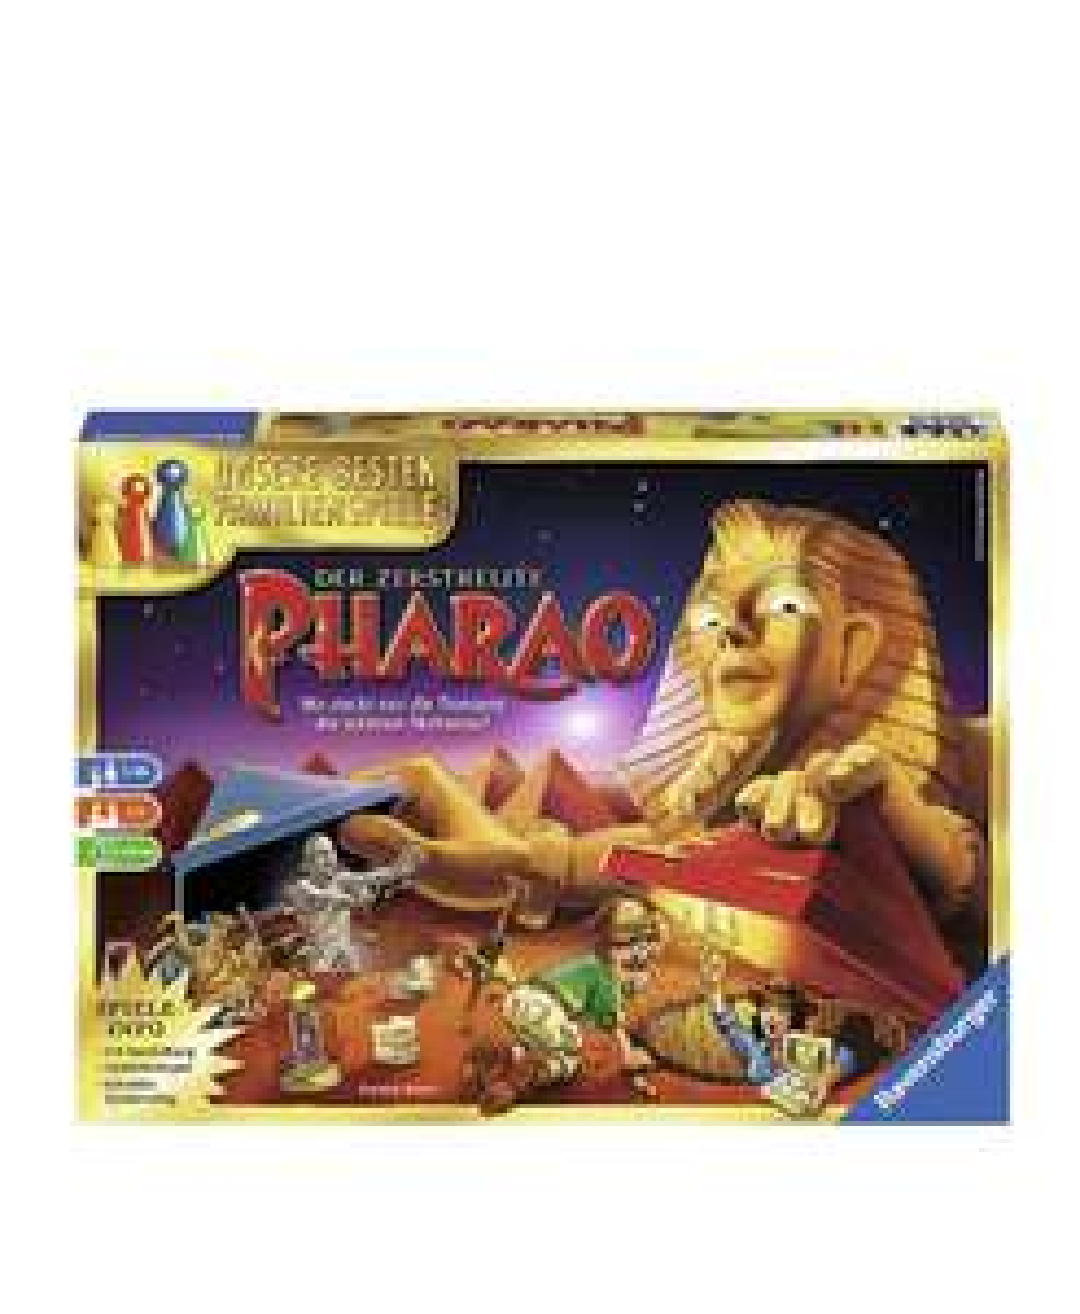 Der zerstreute Pharao (26656) Prime